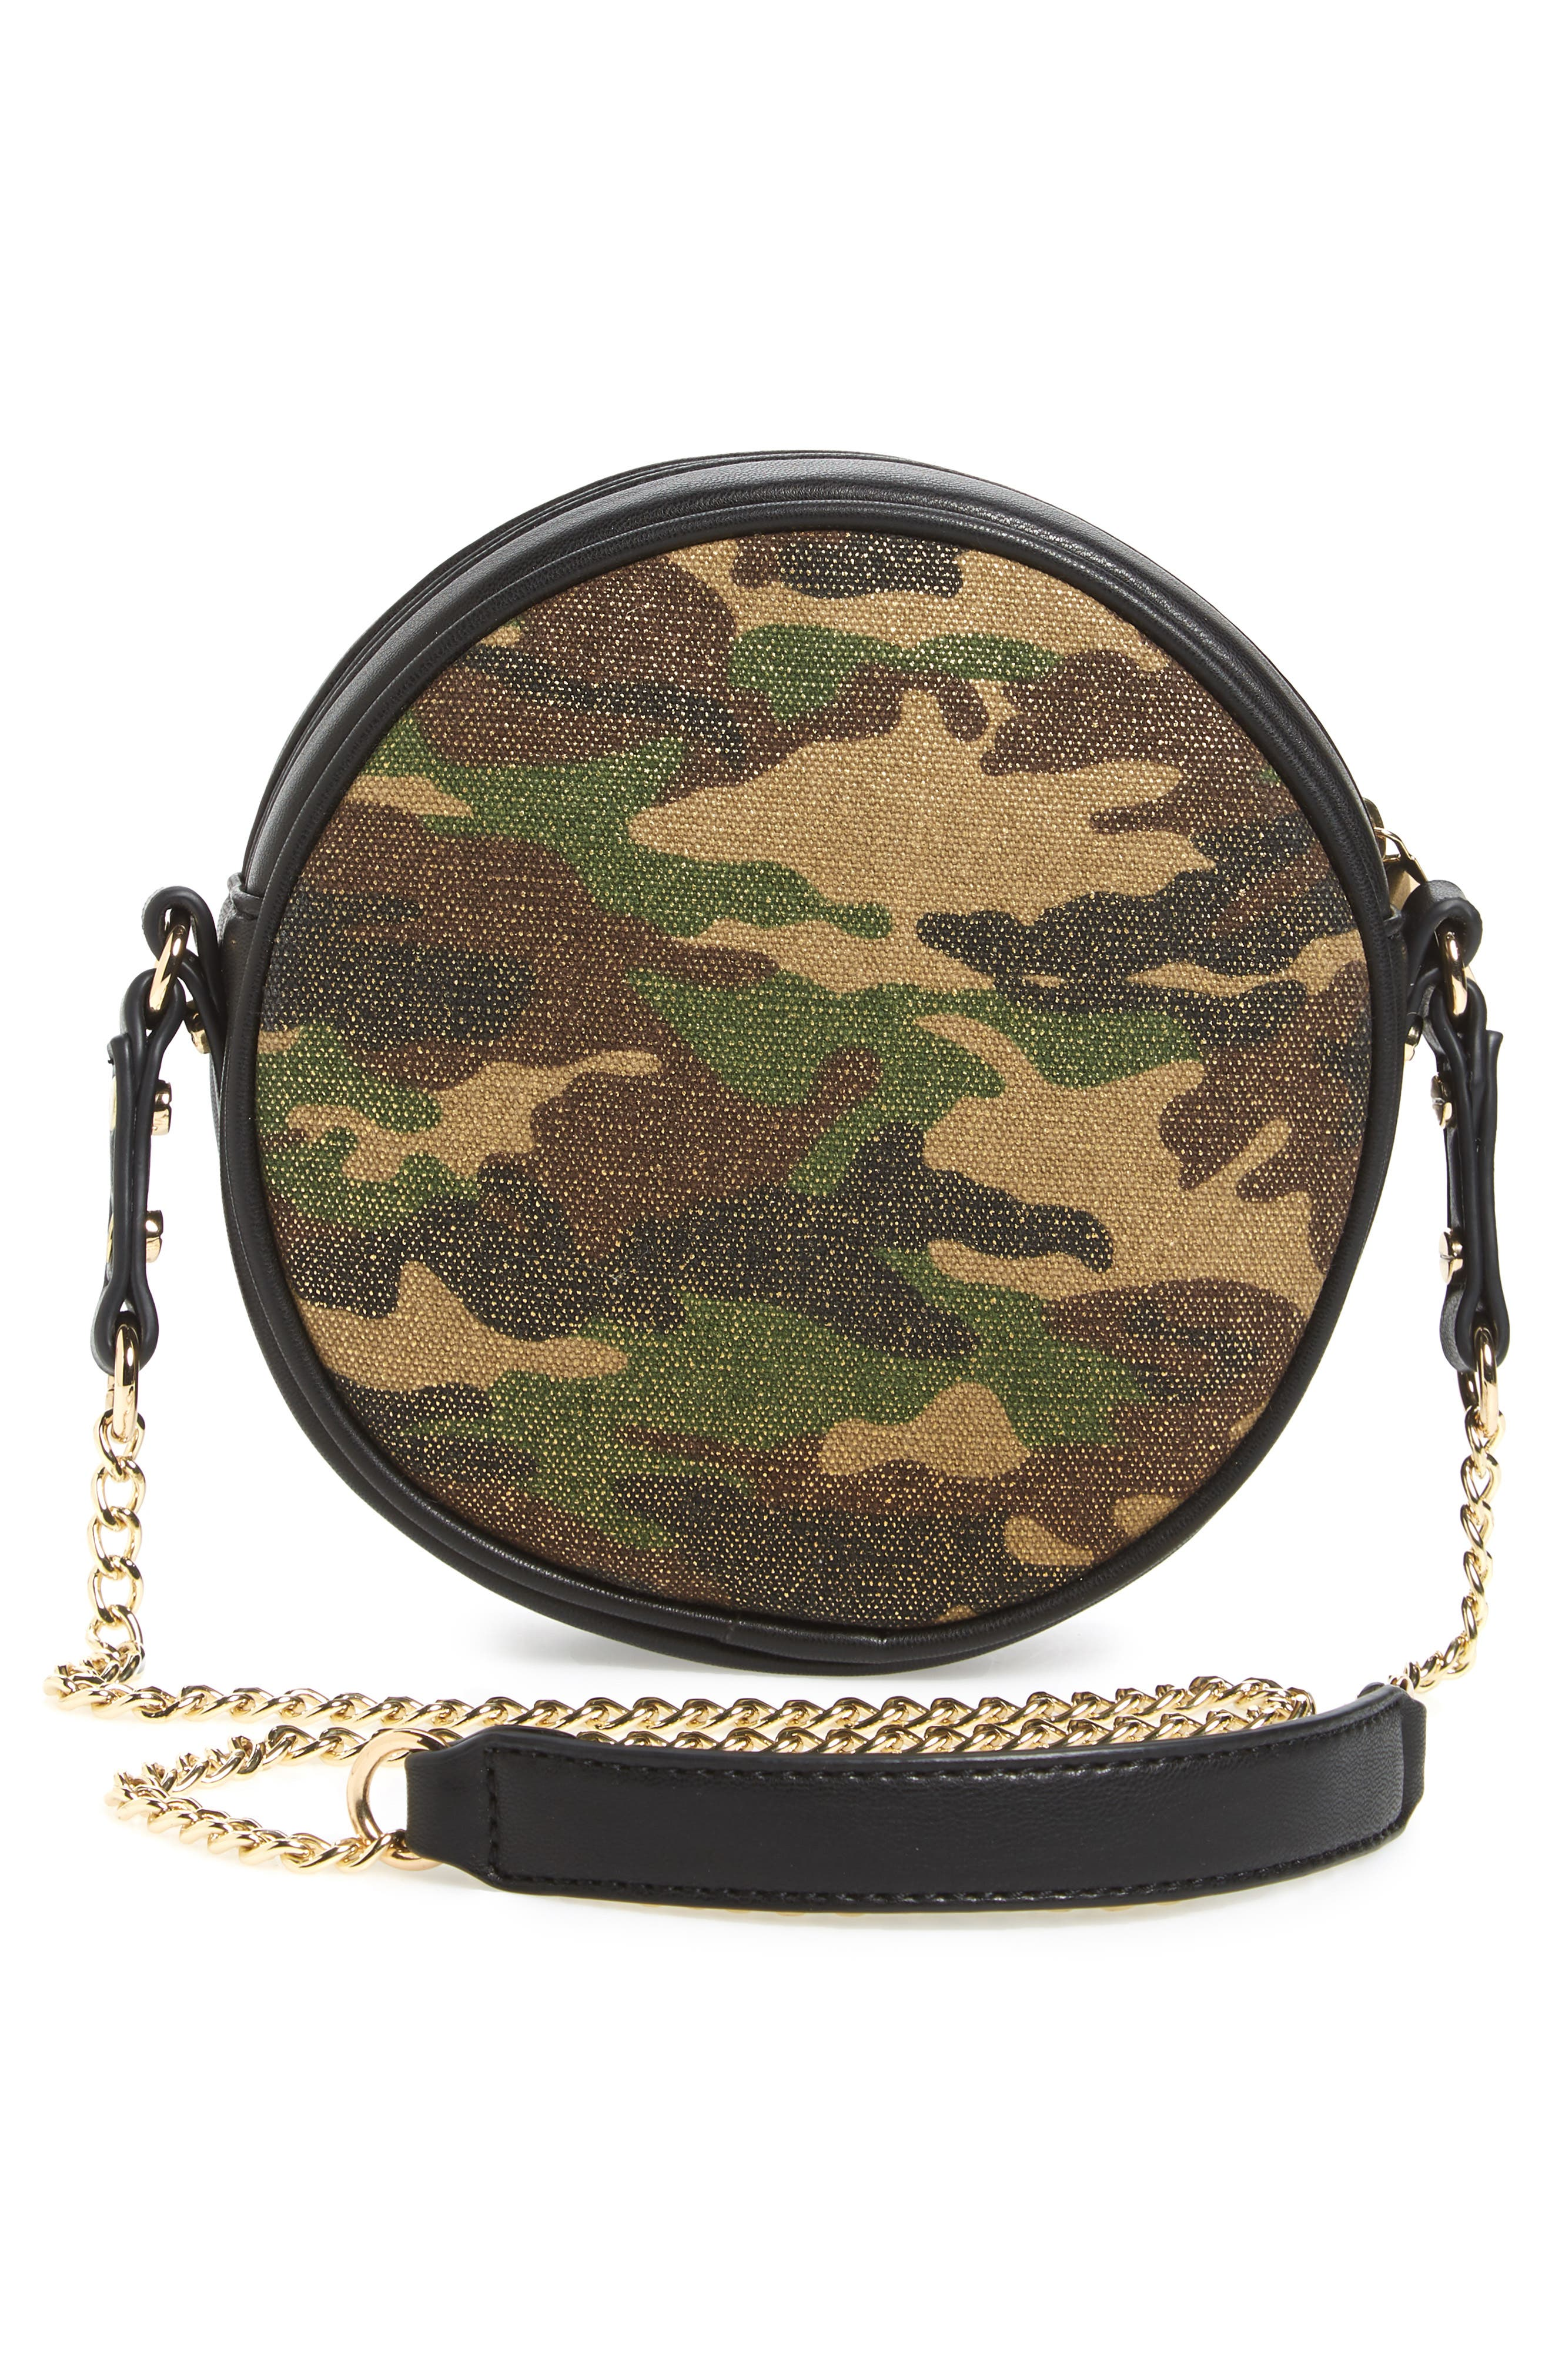 Mali + Lili Camouflage Vegan Leather Canteen Crossbody Bag,                             Alternate thumbnail 3, color,                             340